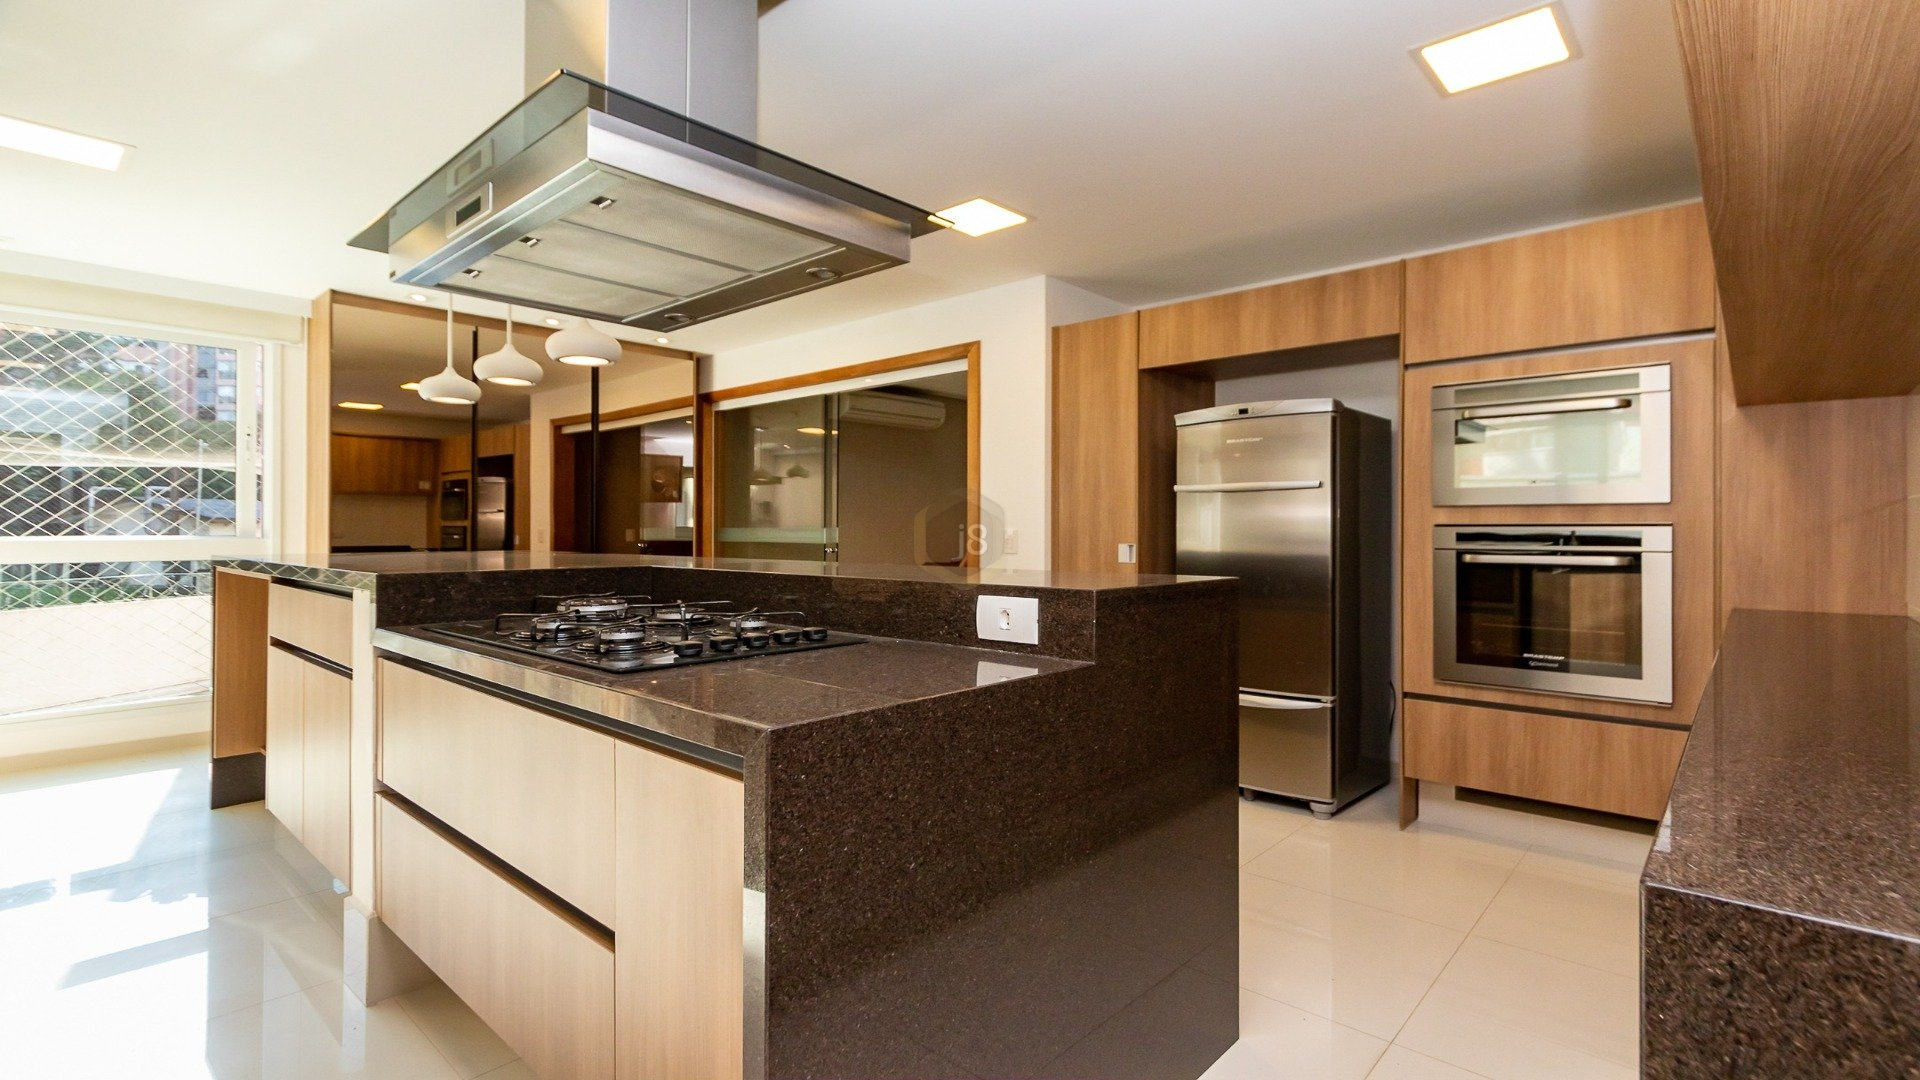 Foto de destaque Apartamento em condomínio clube no cabral com 3 suítes